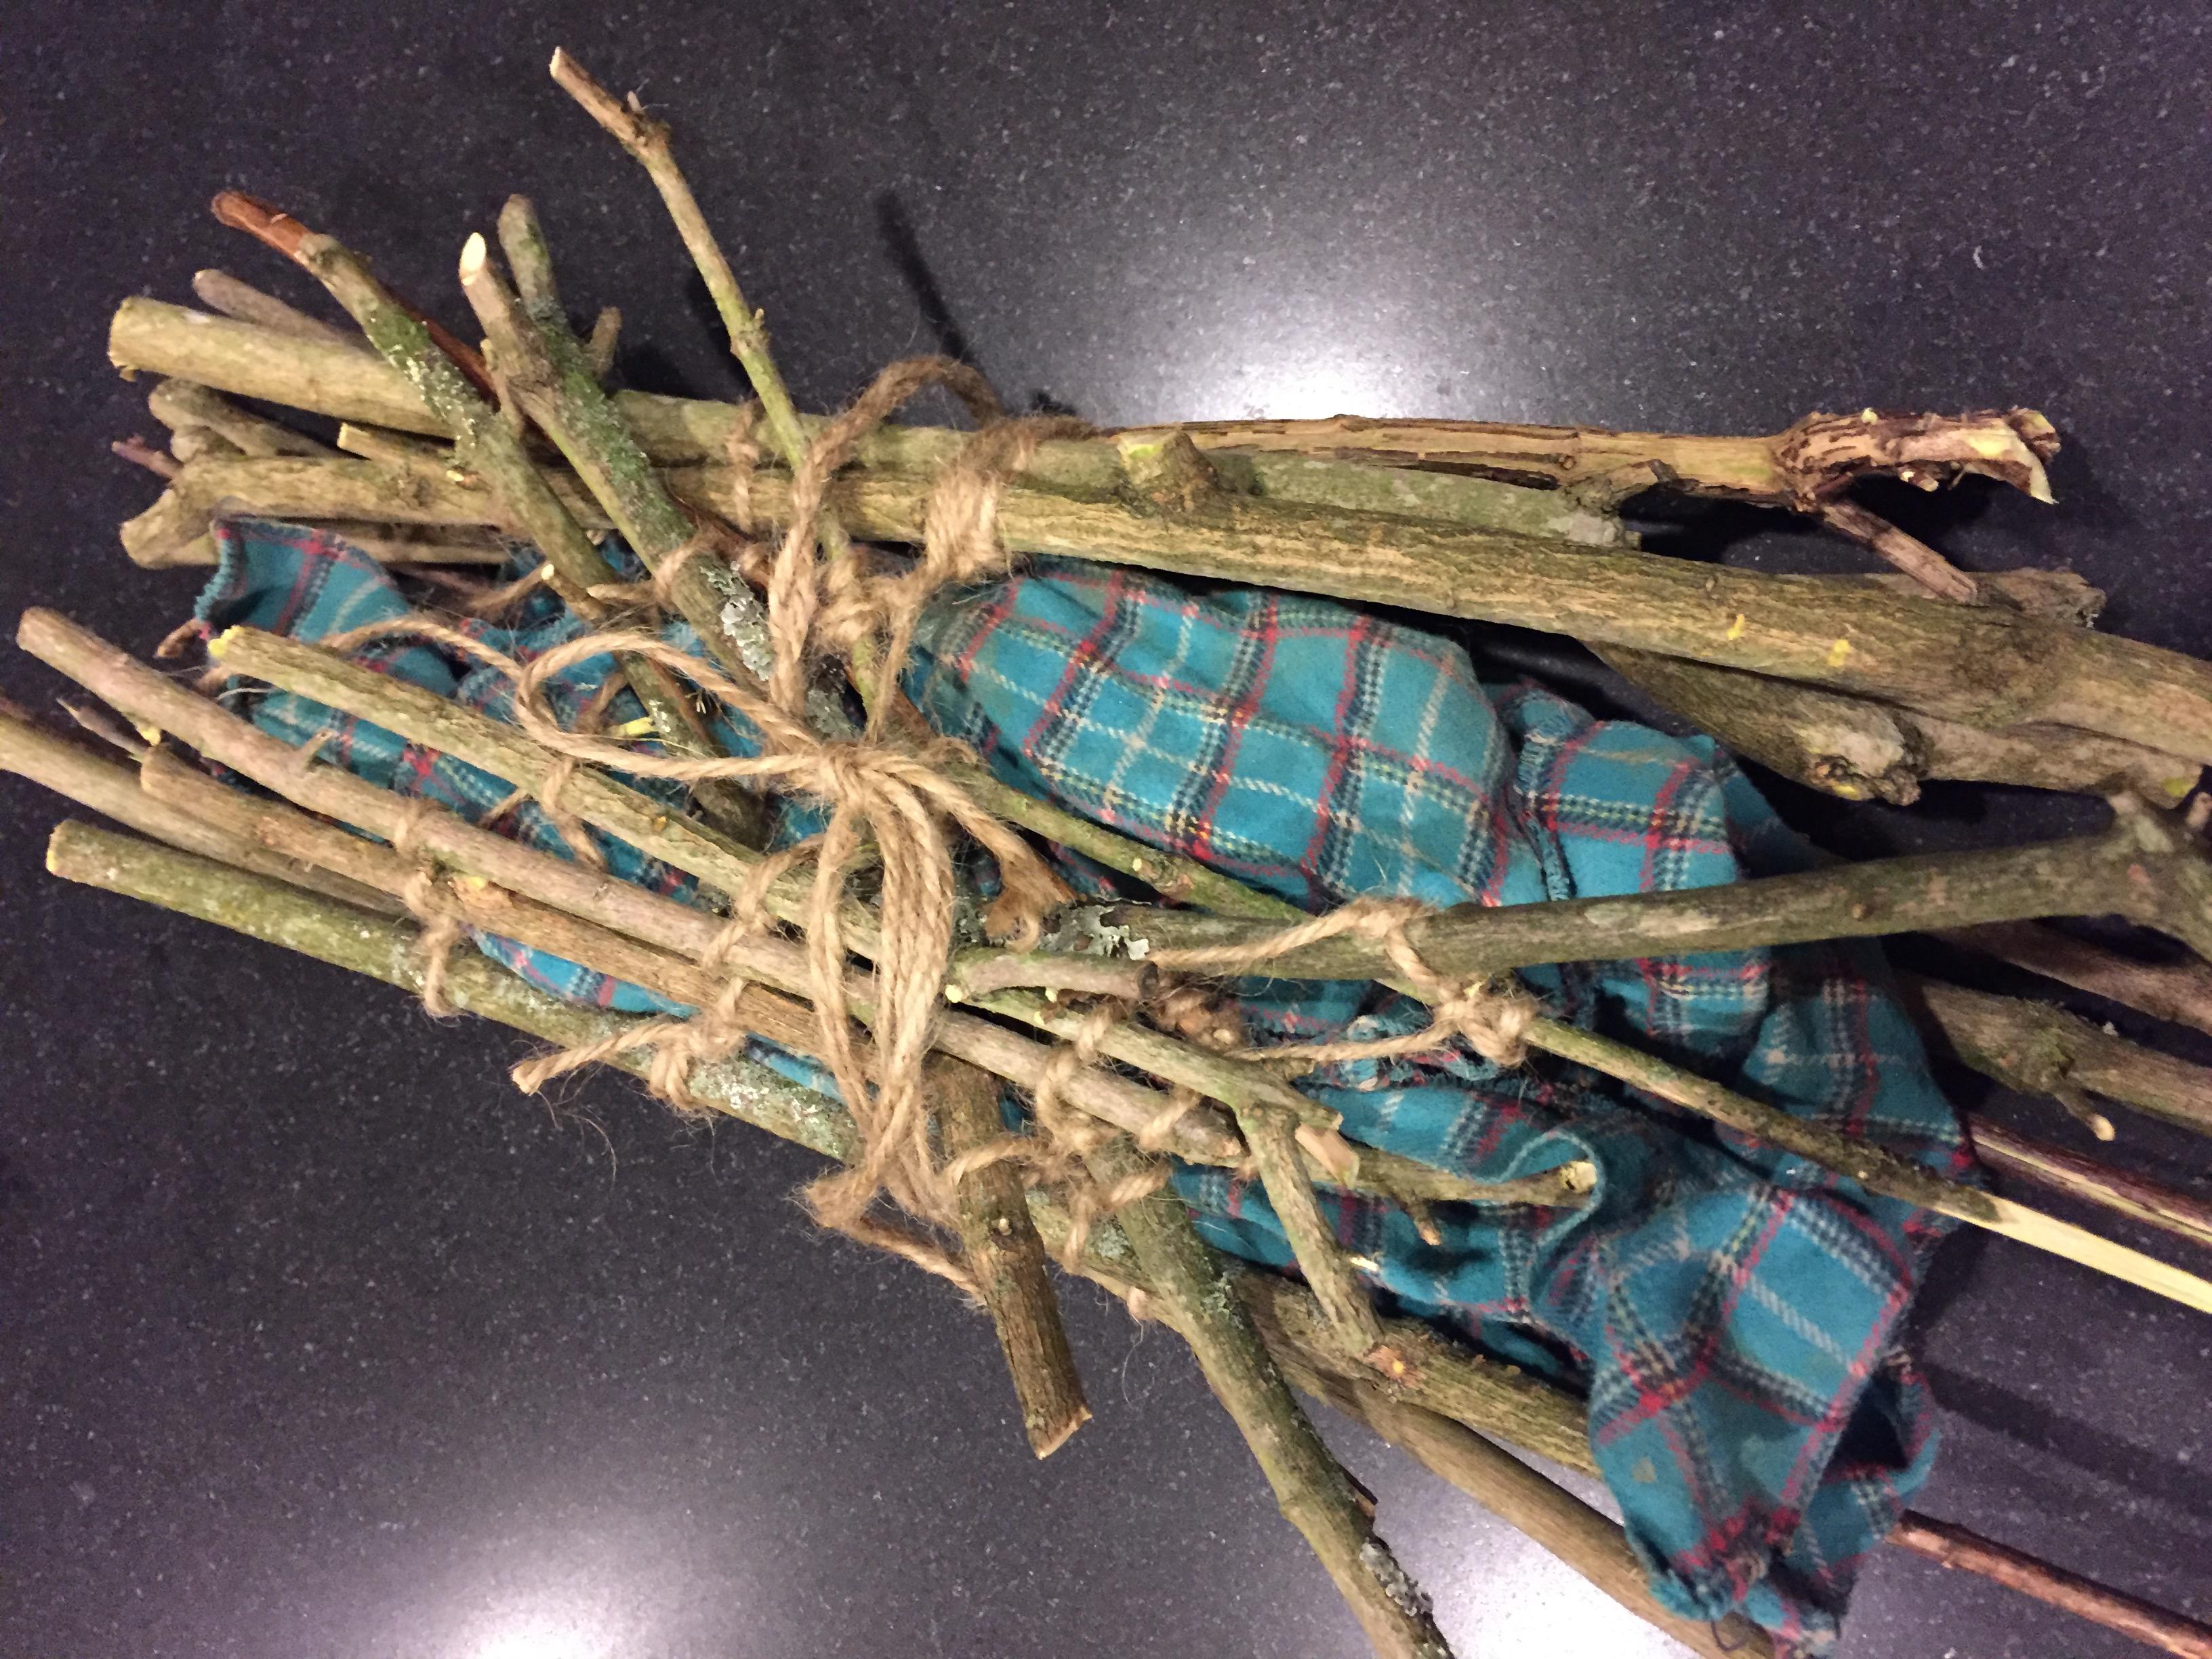 Bundle of sticks by Cerice Odegaard